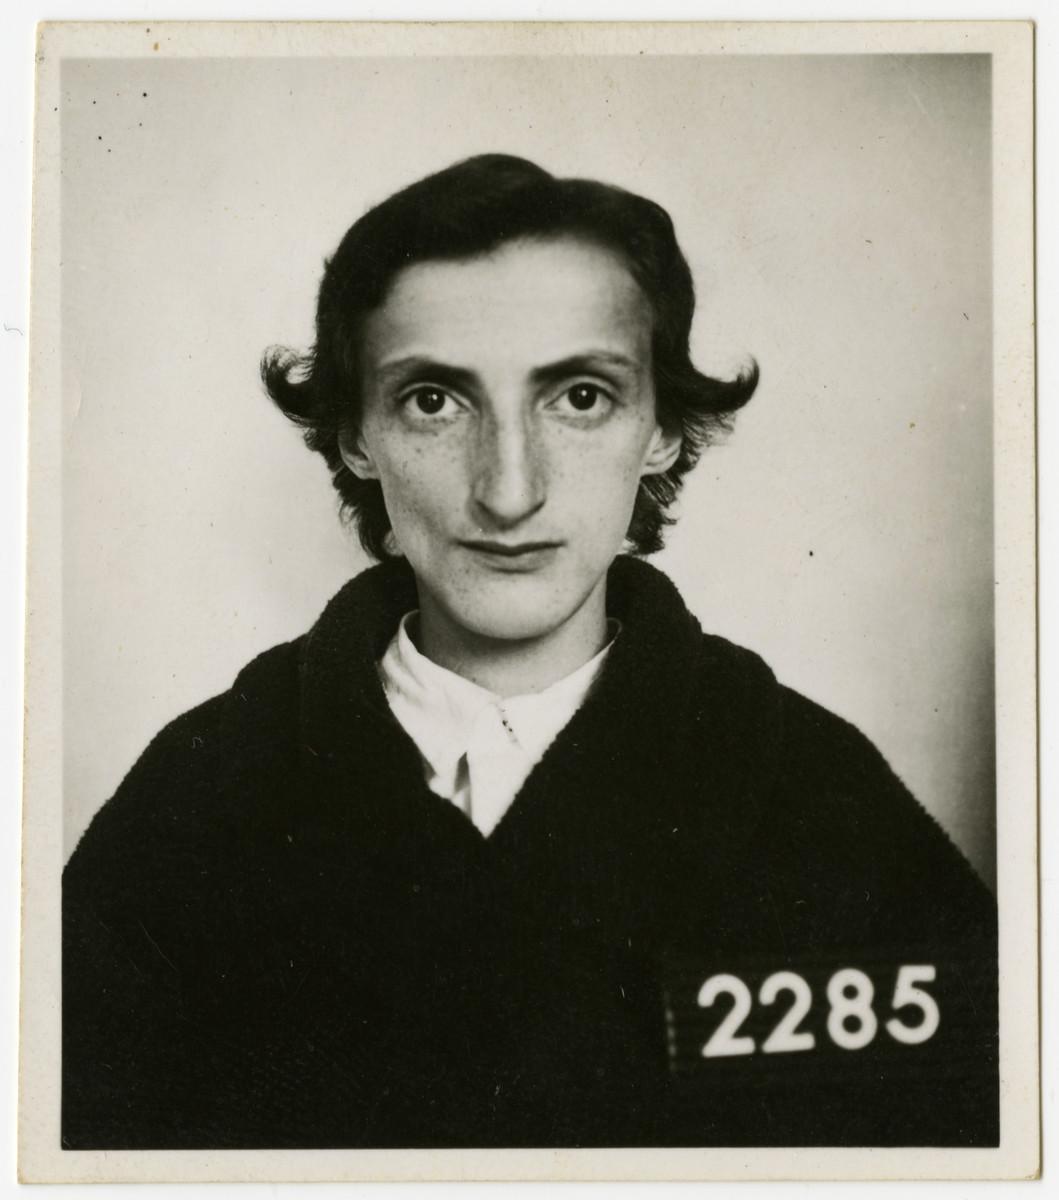 Identification photograph of Jewish Holocaust survivor Sali Berl taken following her liberation from Bergen-Belsen.